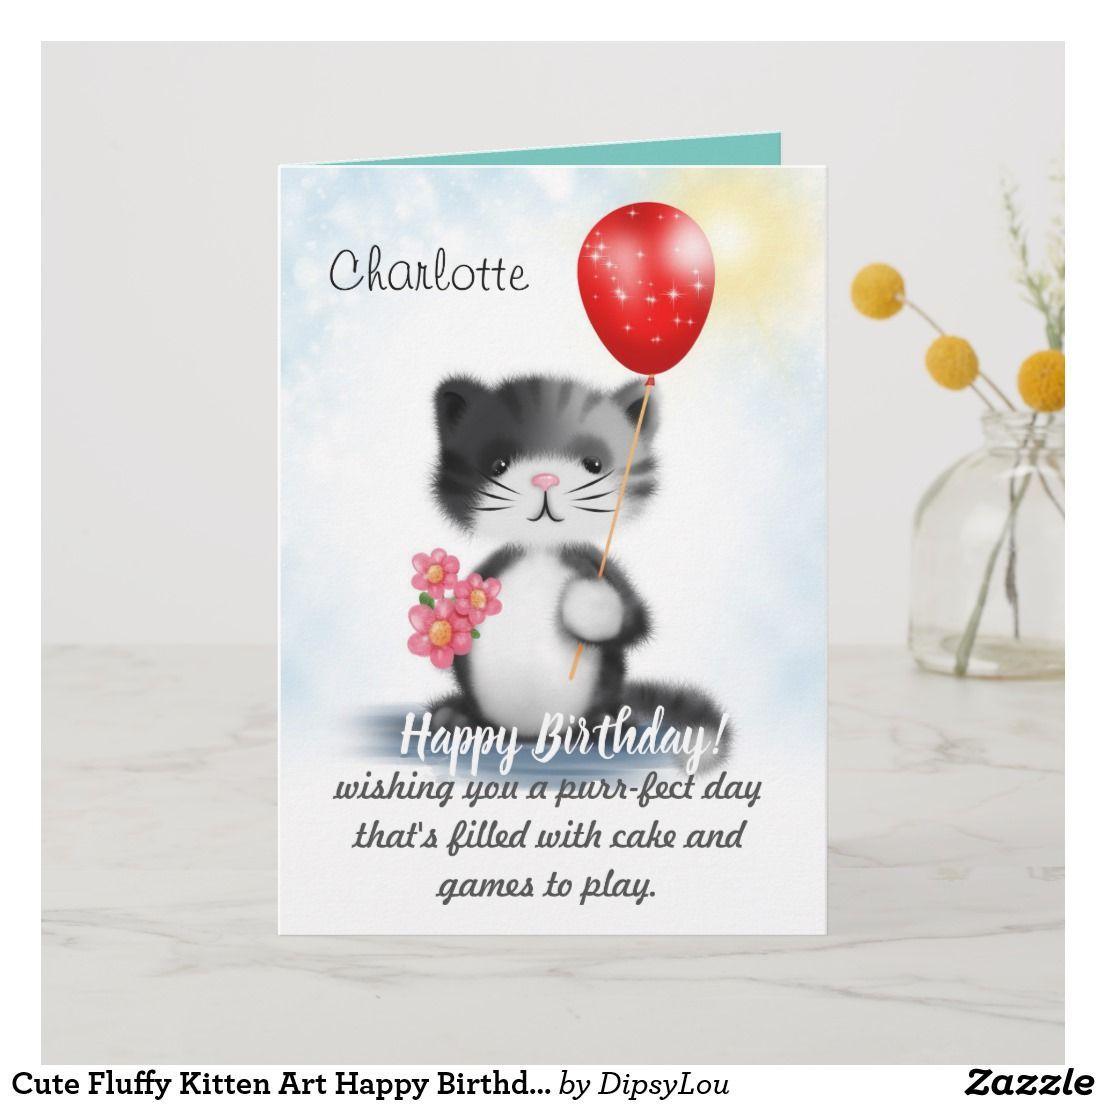 Cute Fluffy Kitten Art Happy Birthday Poem Card Fluffy Kittens Cute Fluffy Kittens Kitten Art